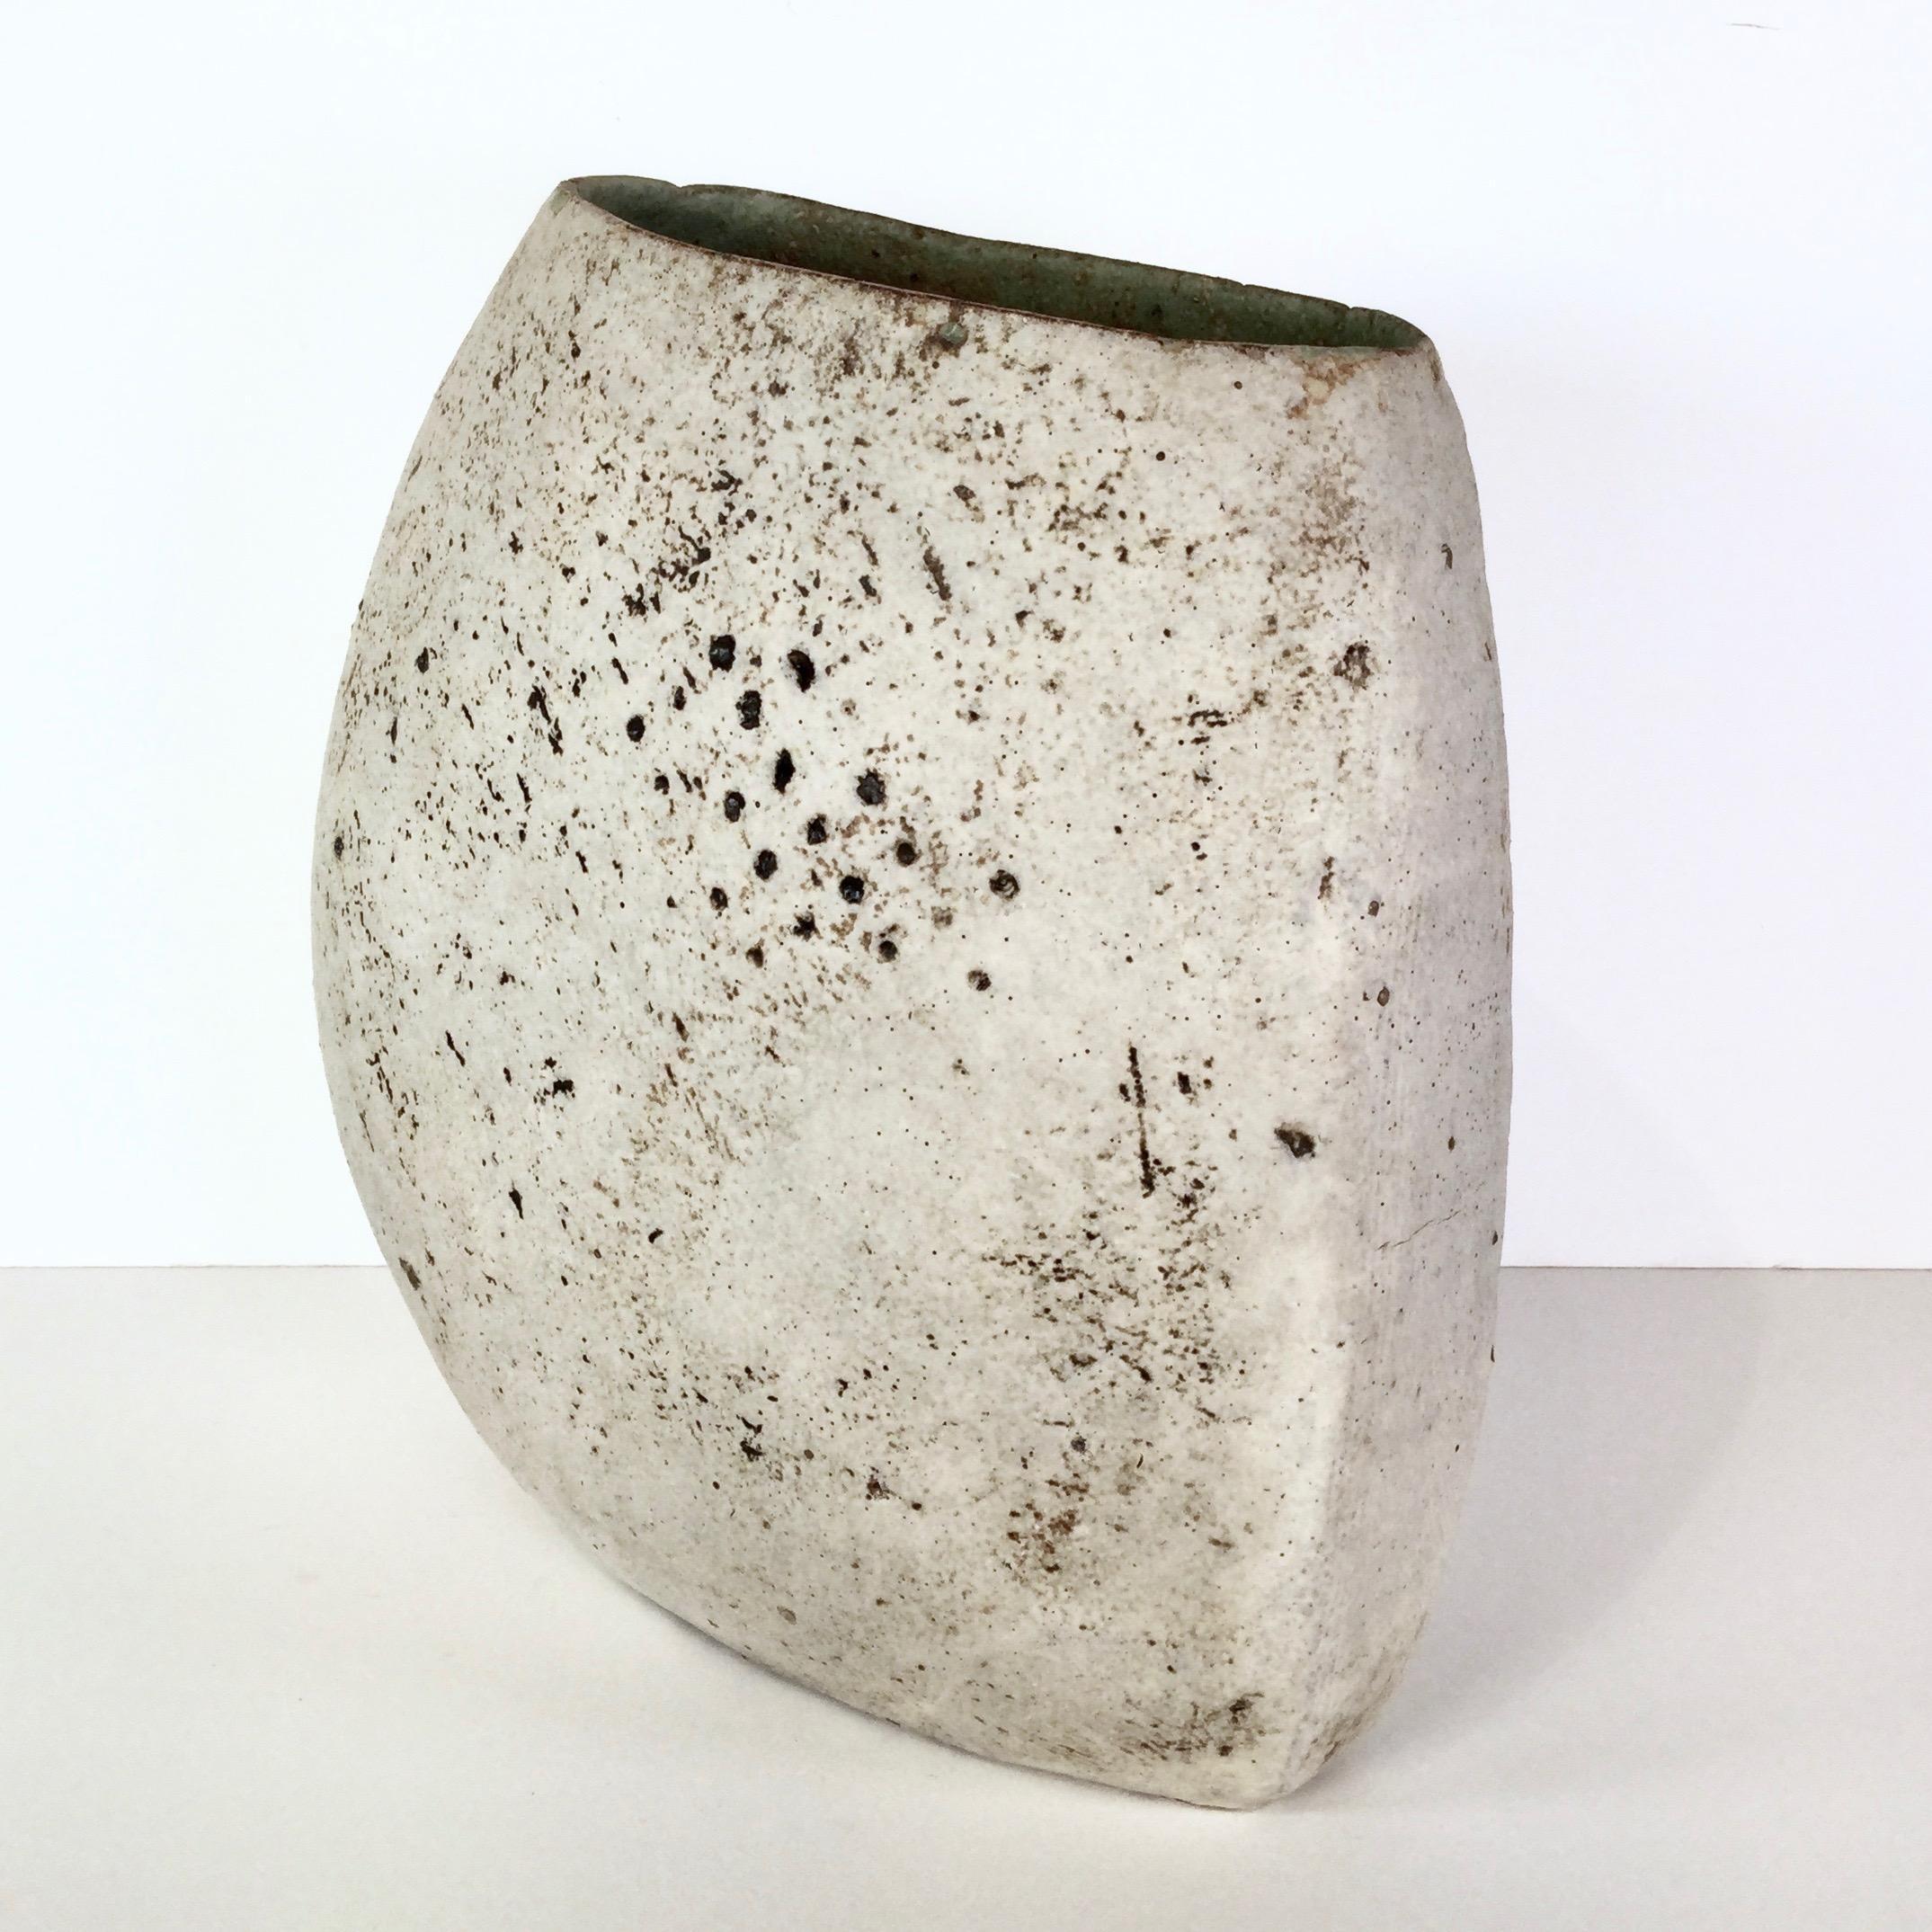 Irregular vessel II, Paul Philp. Stoneware ceramic, chalky, dry white glaze